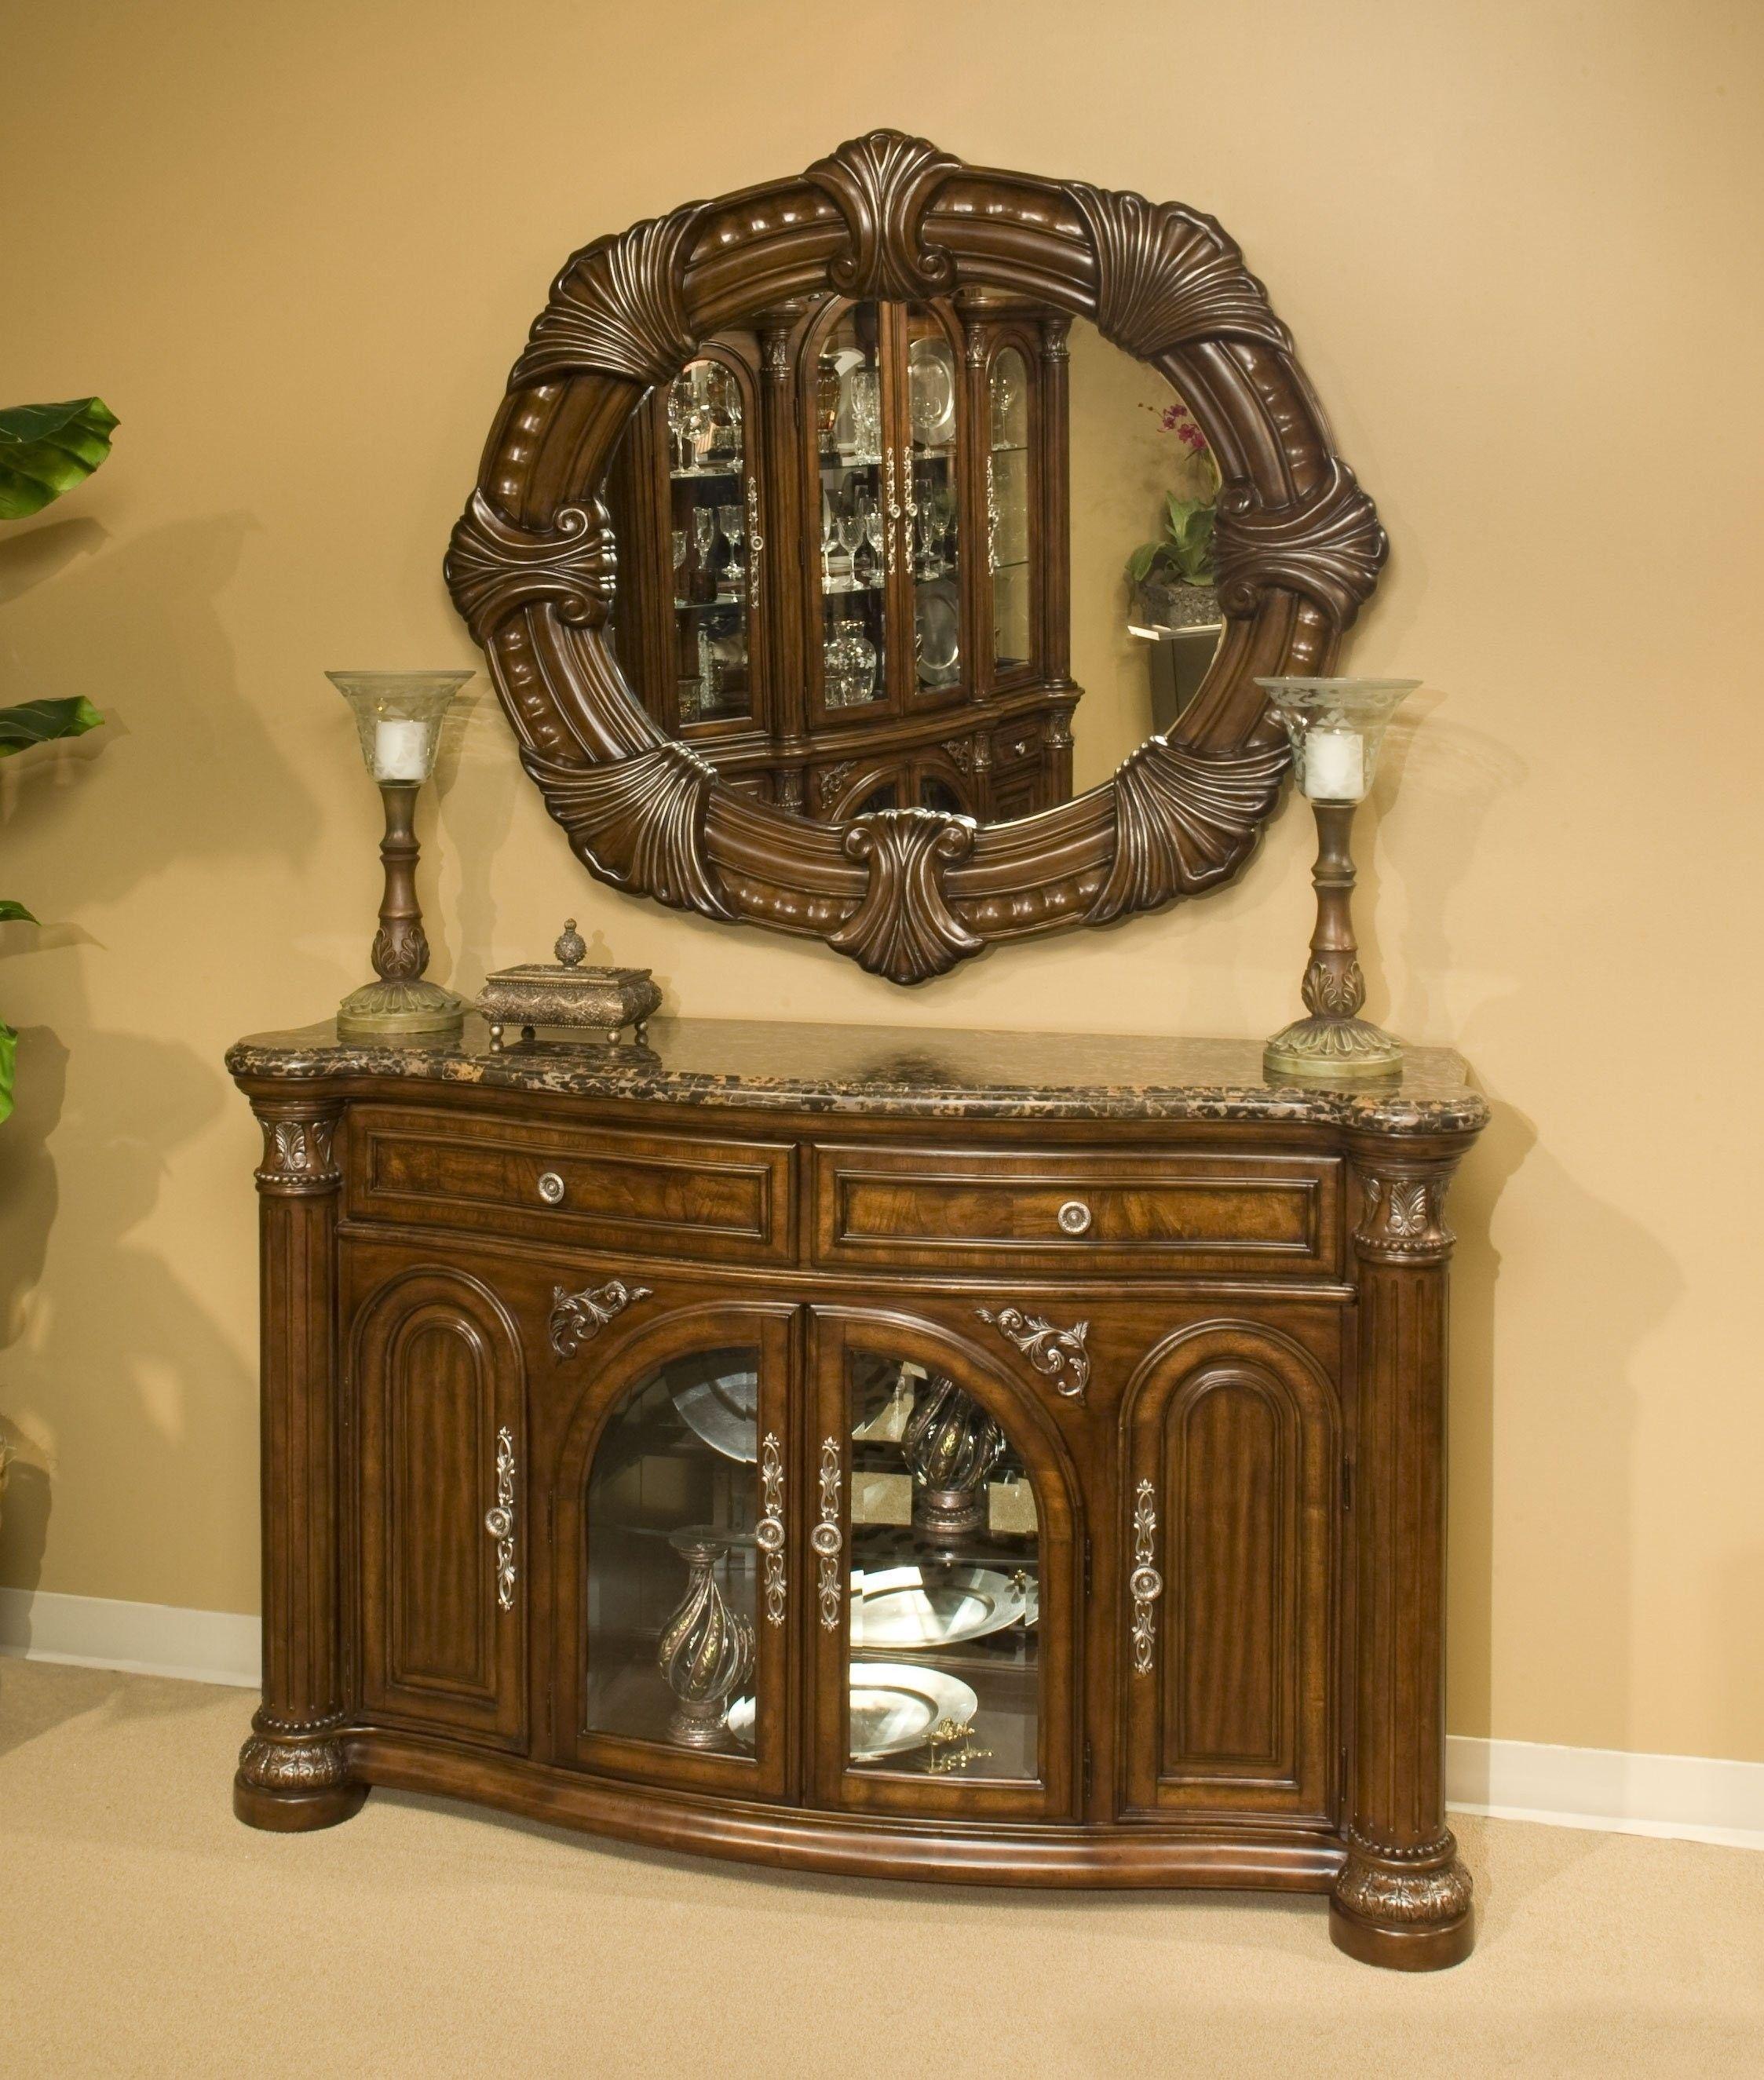 Phoenix Craigslist Furnitureowner East Valley In ...